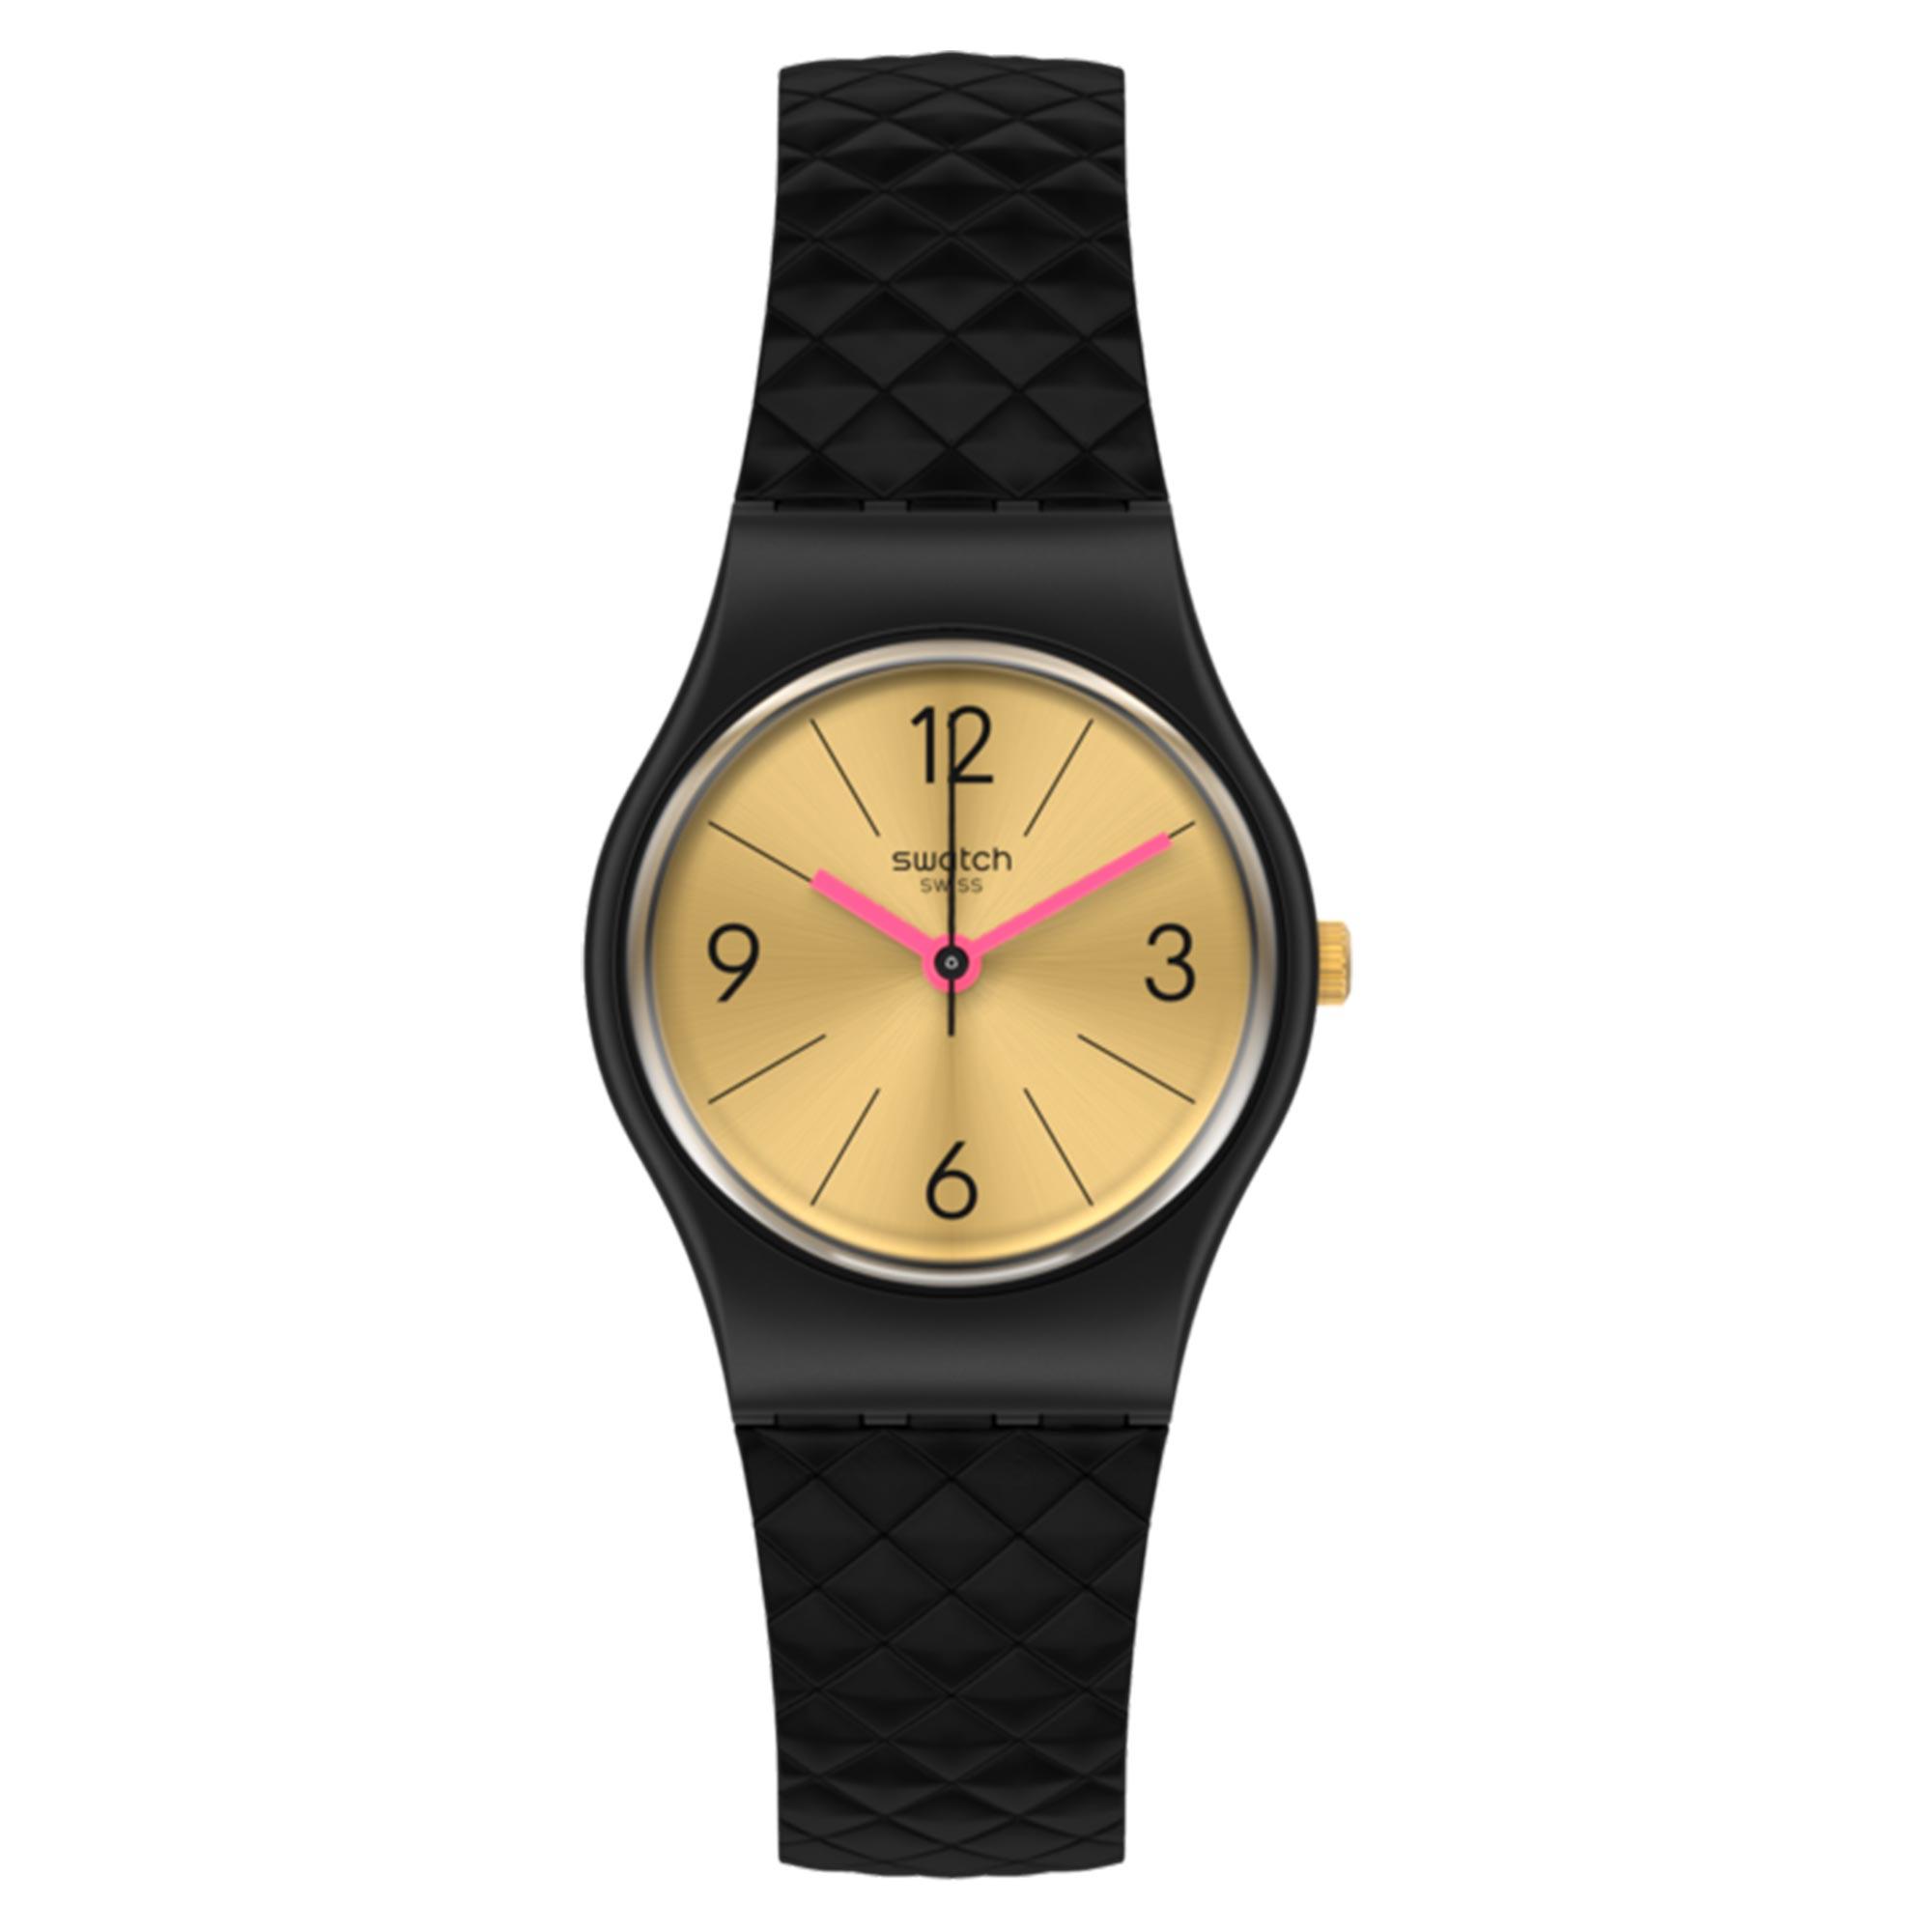 Swatch Luxy Barok Quartz Gold Dial Black Silicone Strap Ladies Watch LB187